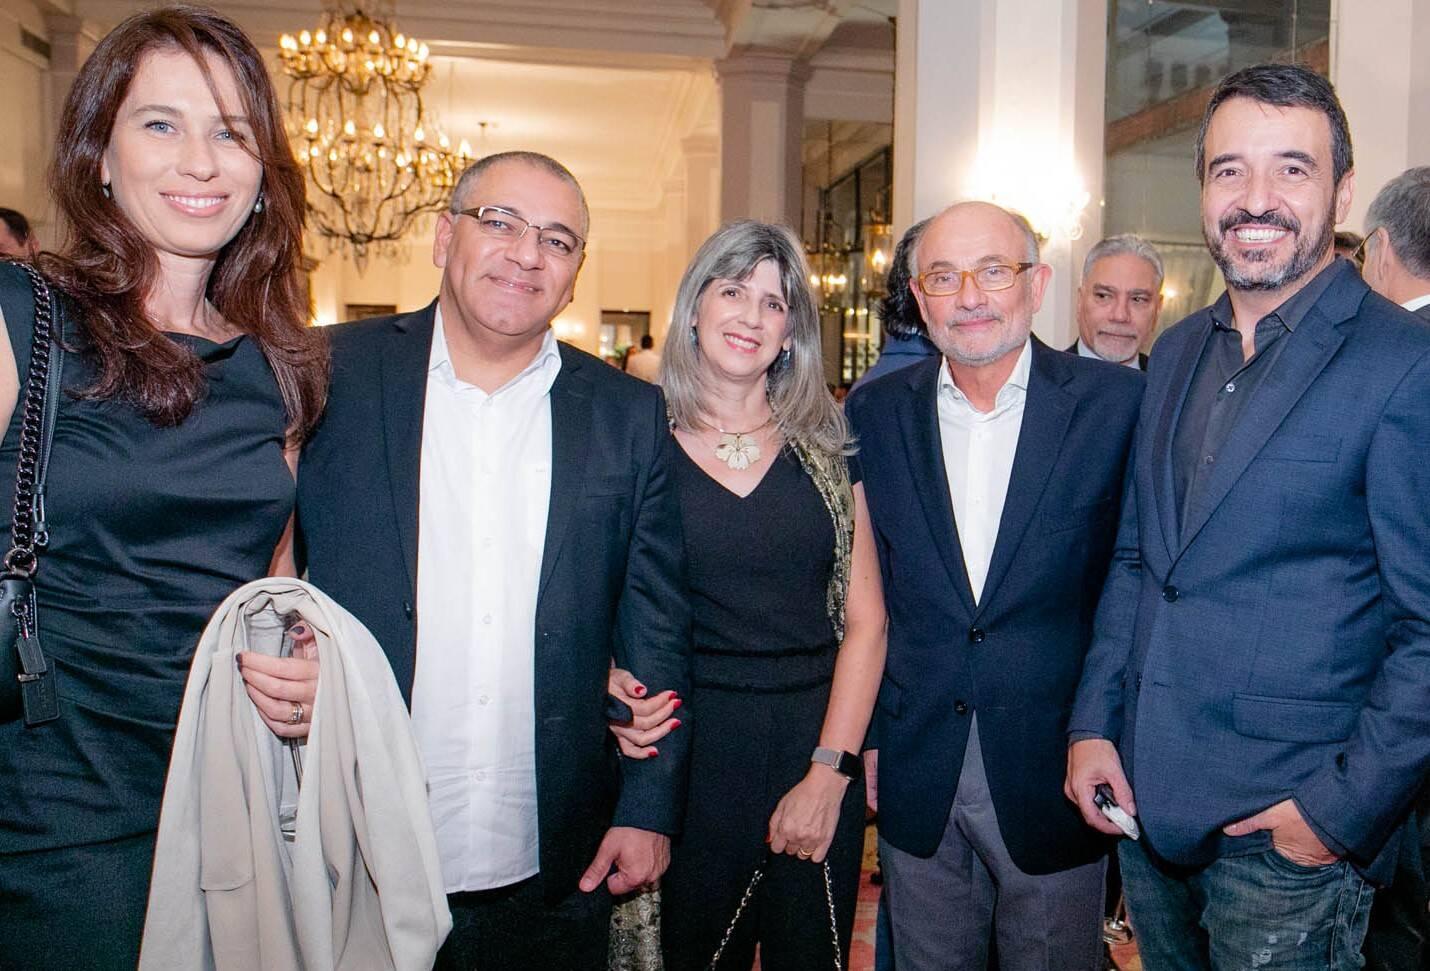 Alessandra Borges, Fabiano Freitas, Silvana Freitas, Marcos Borges e Cyd Alvarez /Foto: Miguel Sá